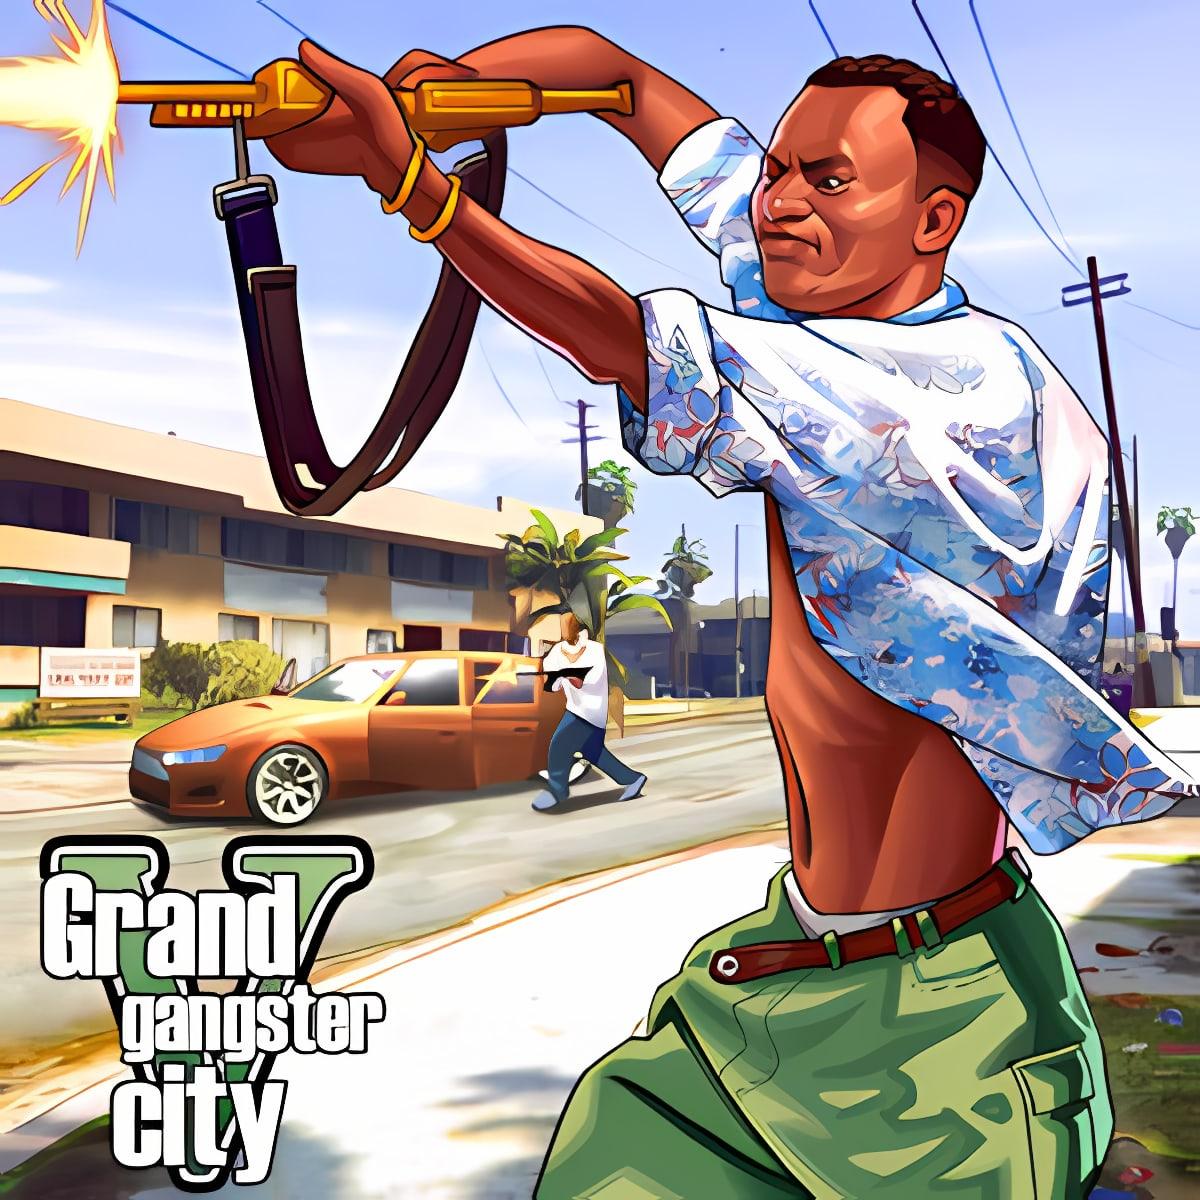 Grand gangster city